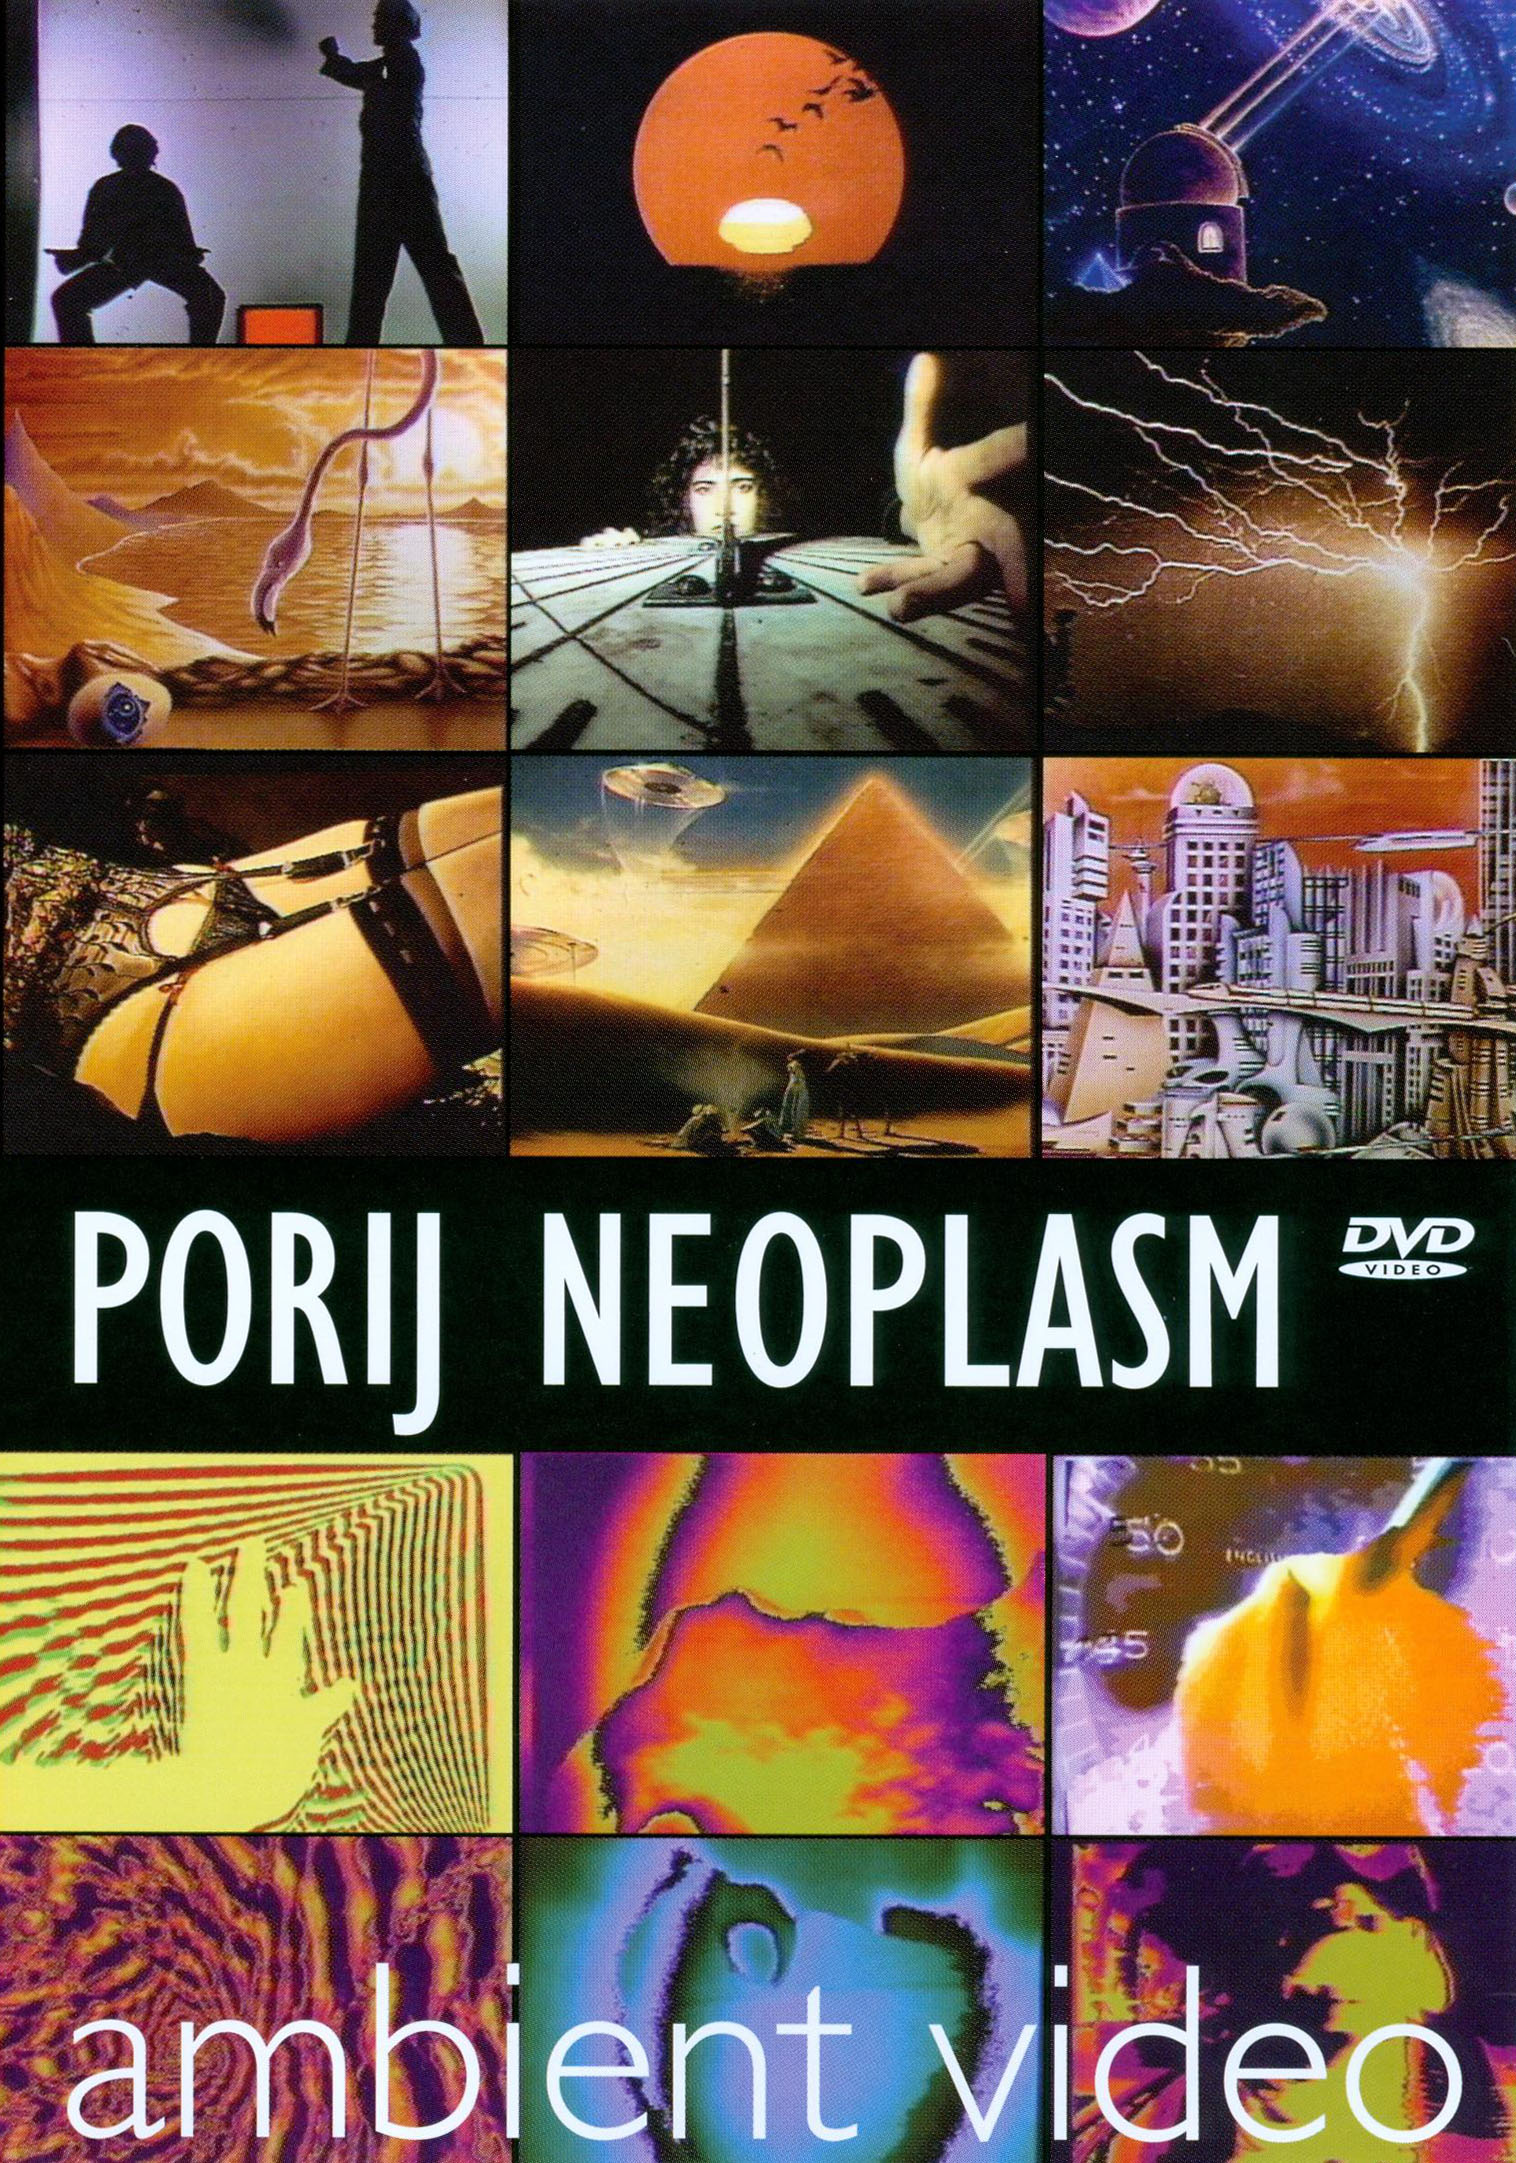 Porij Neoplasm (2011)